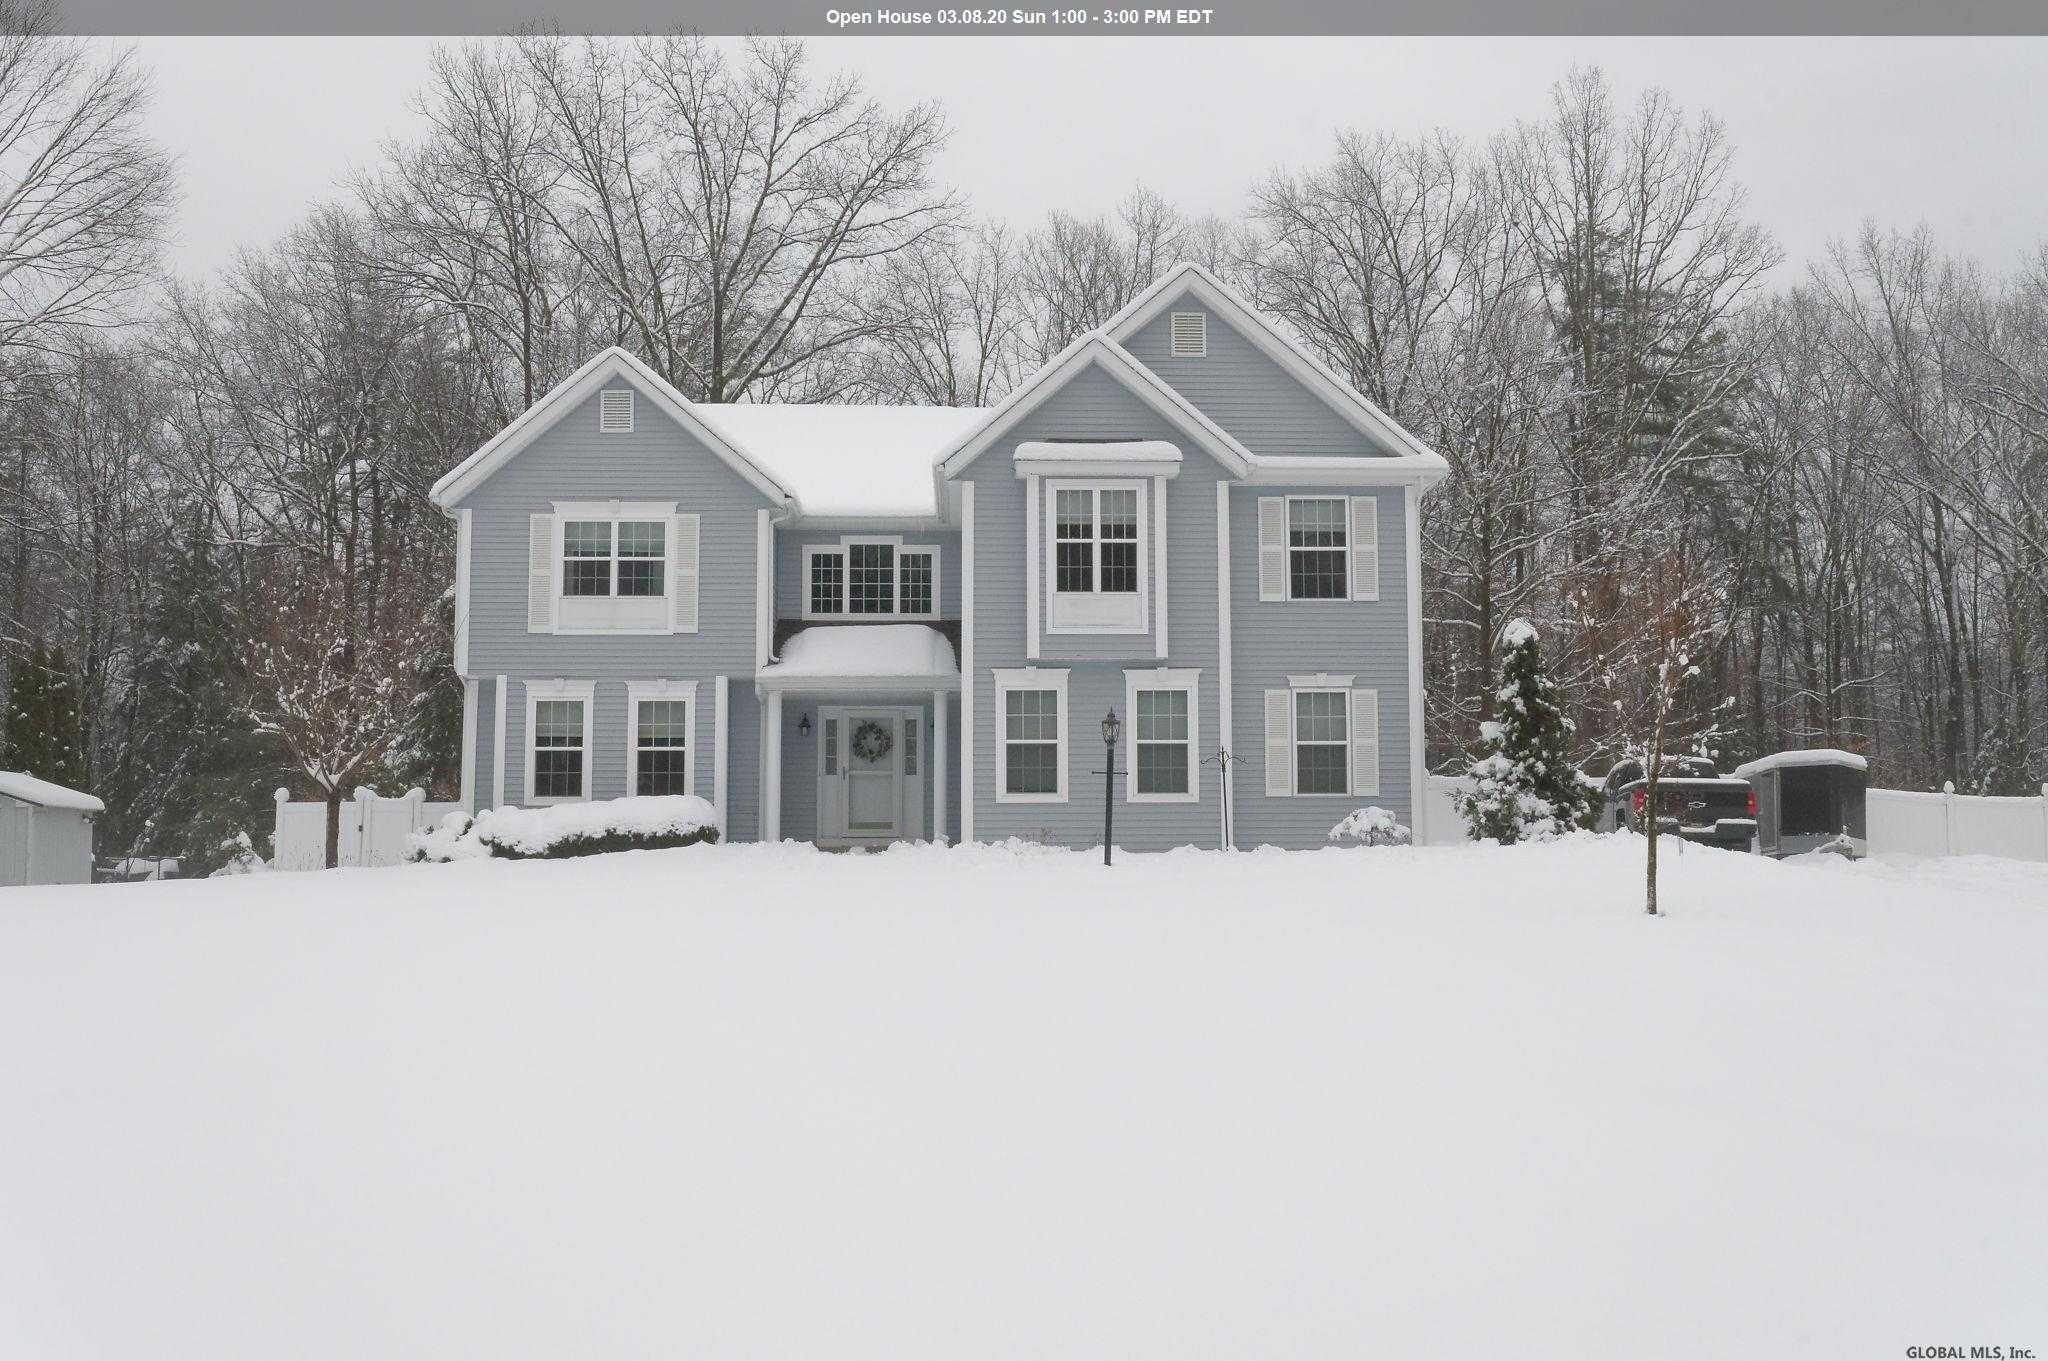 $409,000 - 4Br/3Ba -  for Sale in Wilton